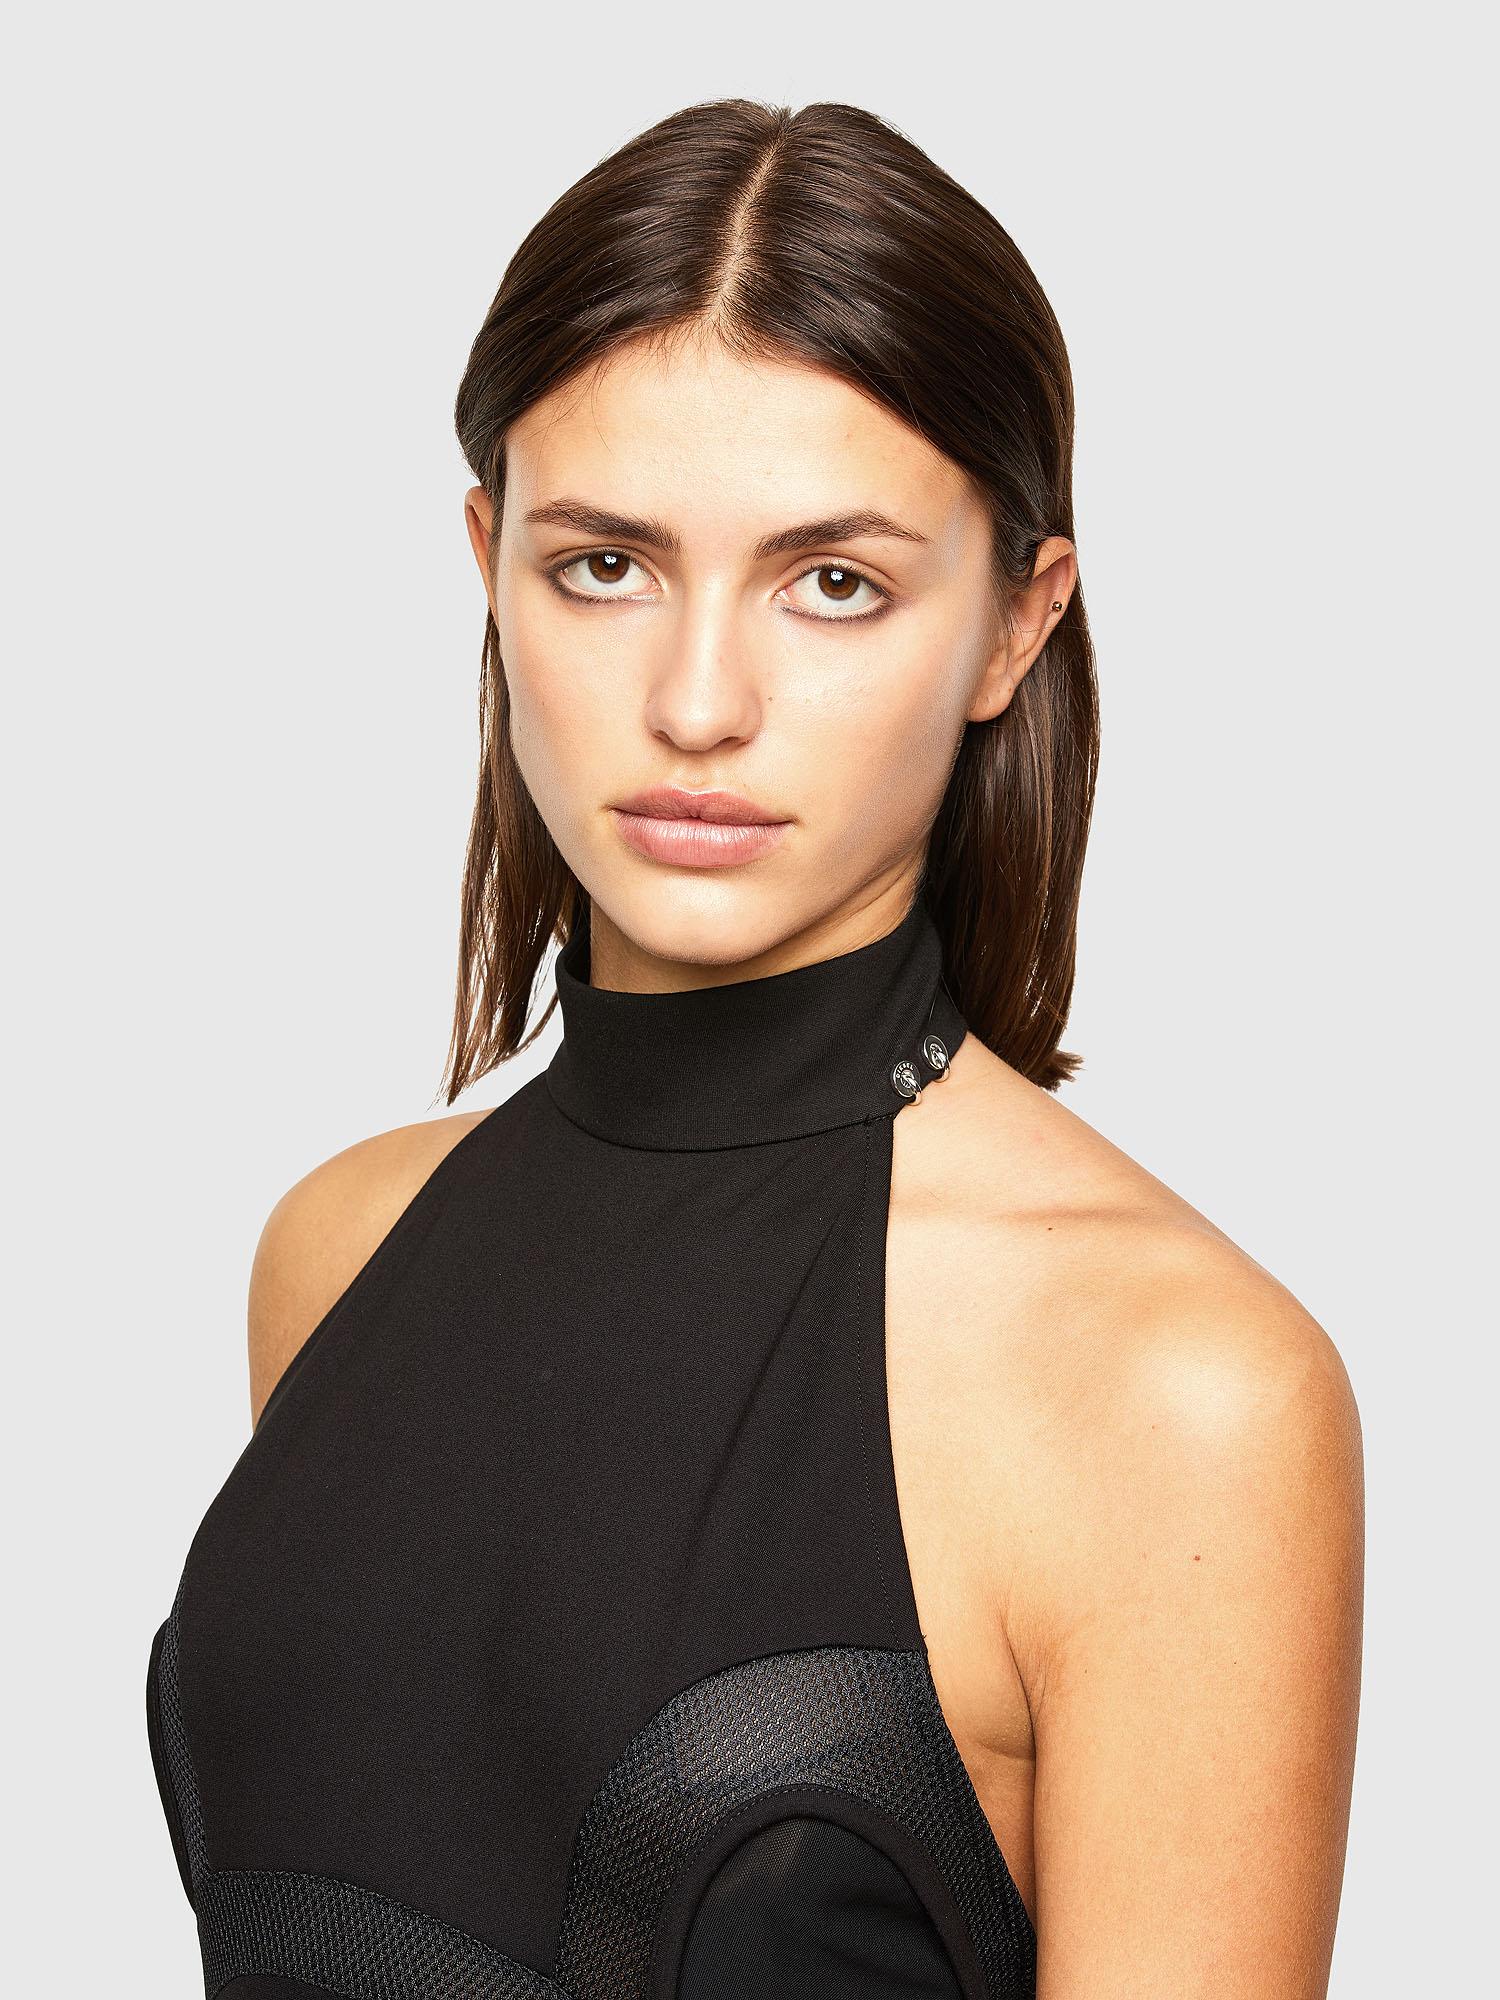 Diesel - D-ELIGHT, Black - Dresses - Image 3